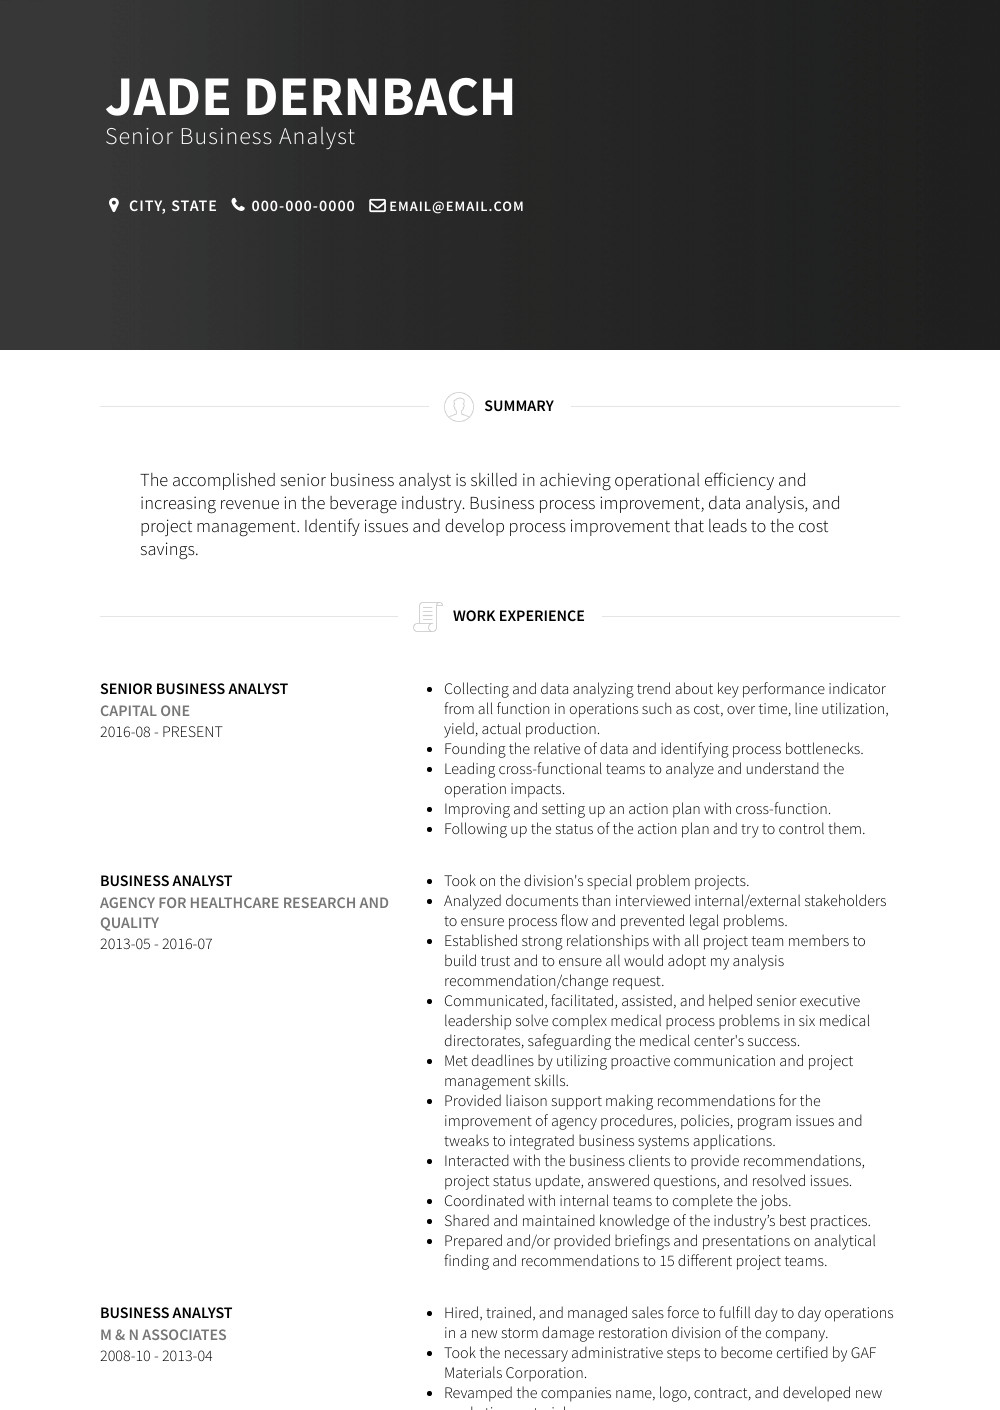 Senior Business Analyst Resume Senior Business Analyst Resume Samples & Templates